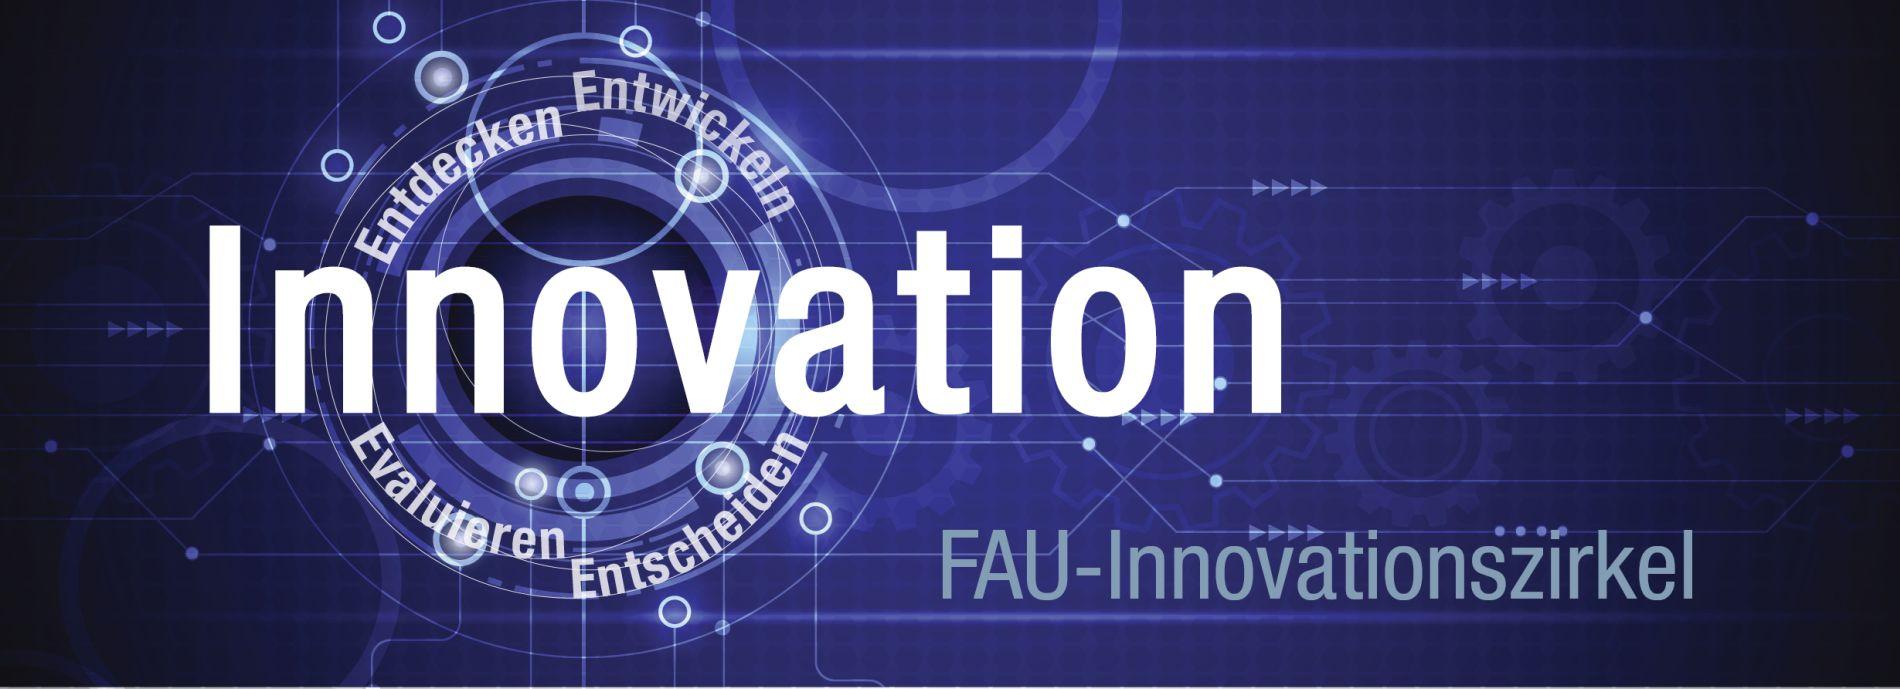 Innovationszyklus